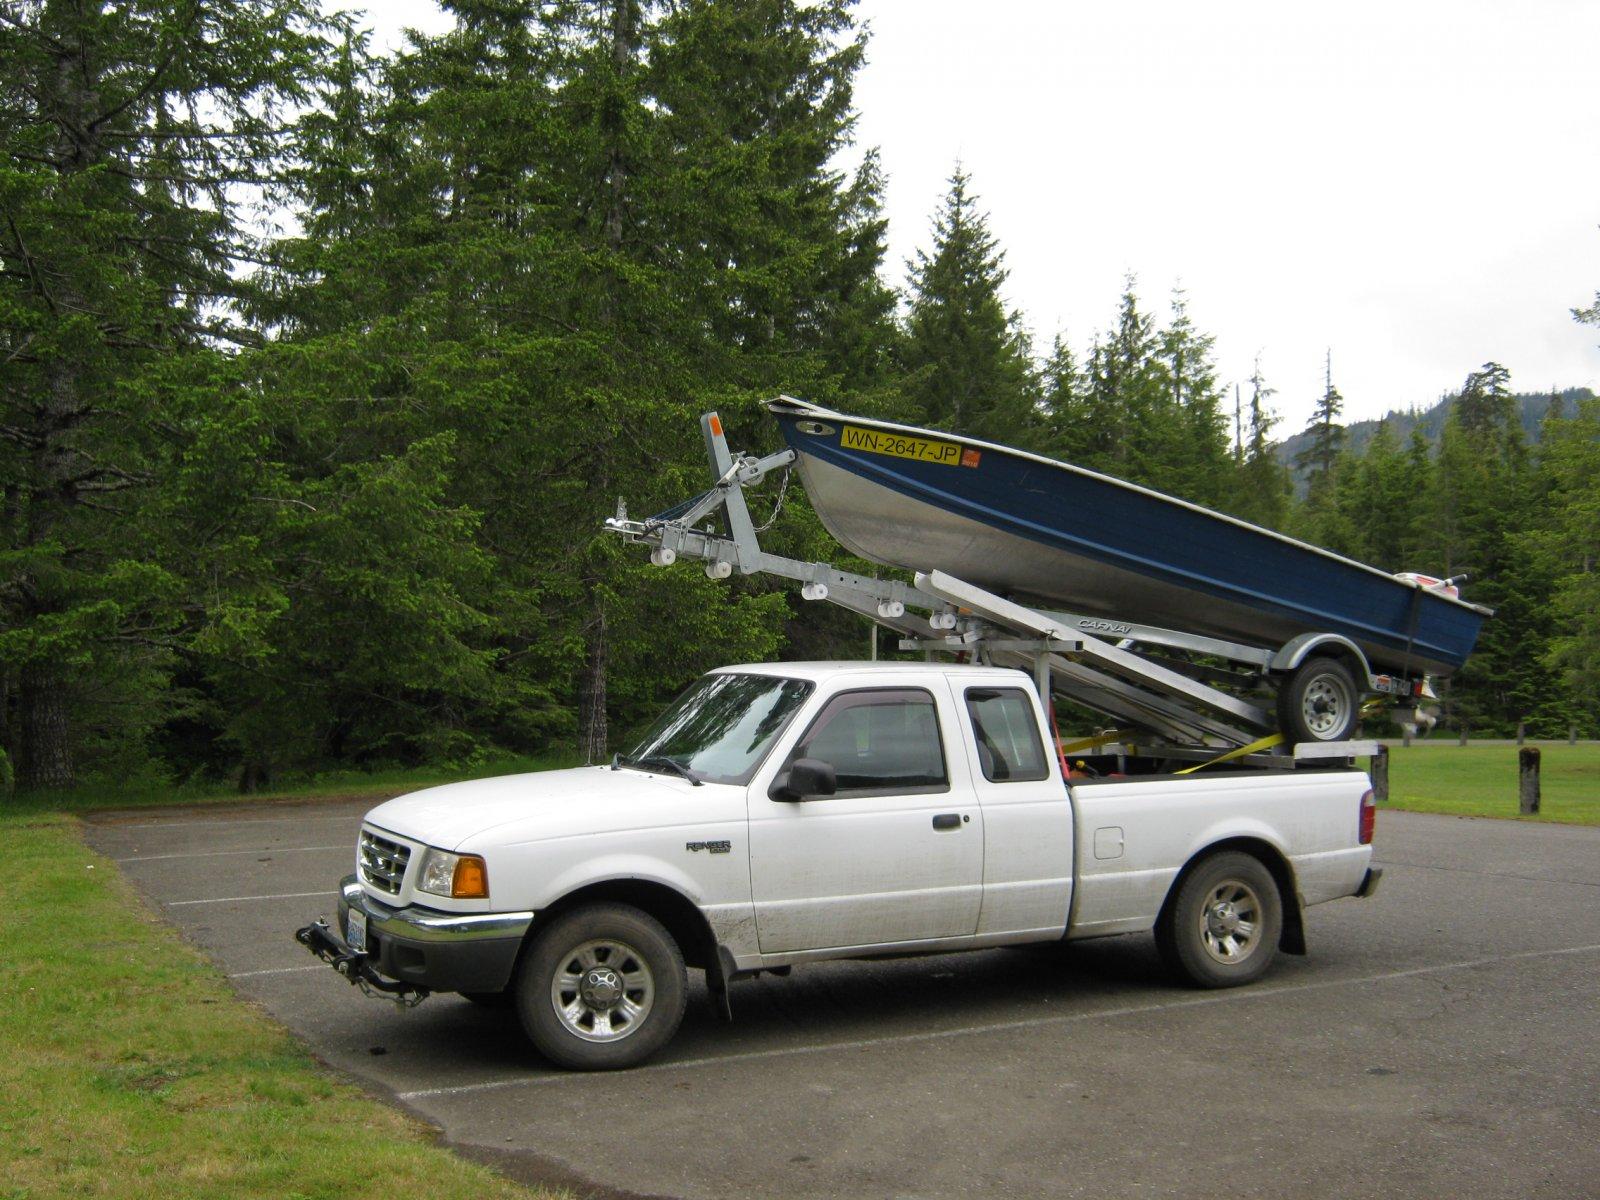 Click image for larger version  Name:Boat rack jack.jpg Views:2905 Size:368.6 KB ID:12600